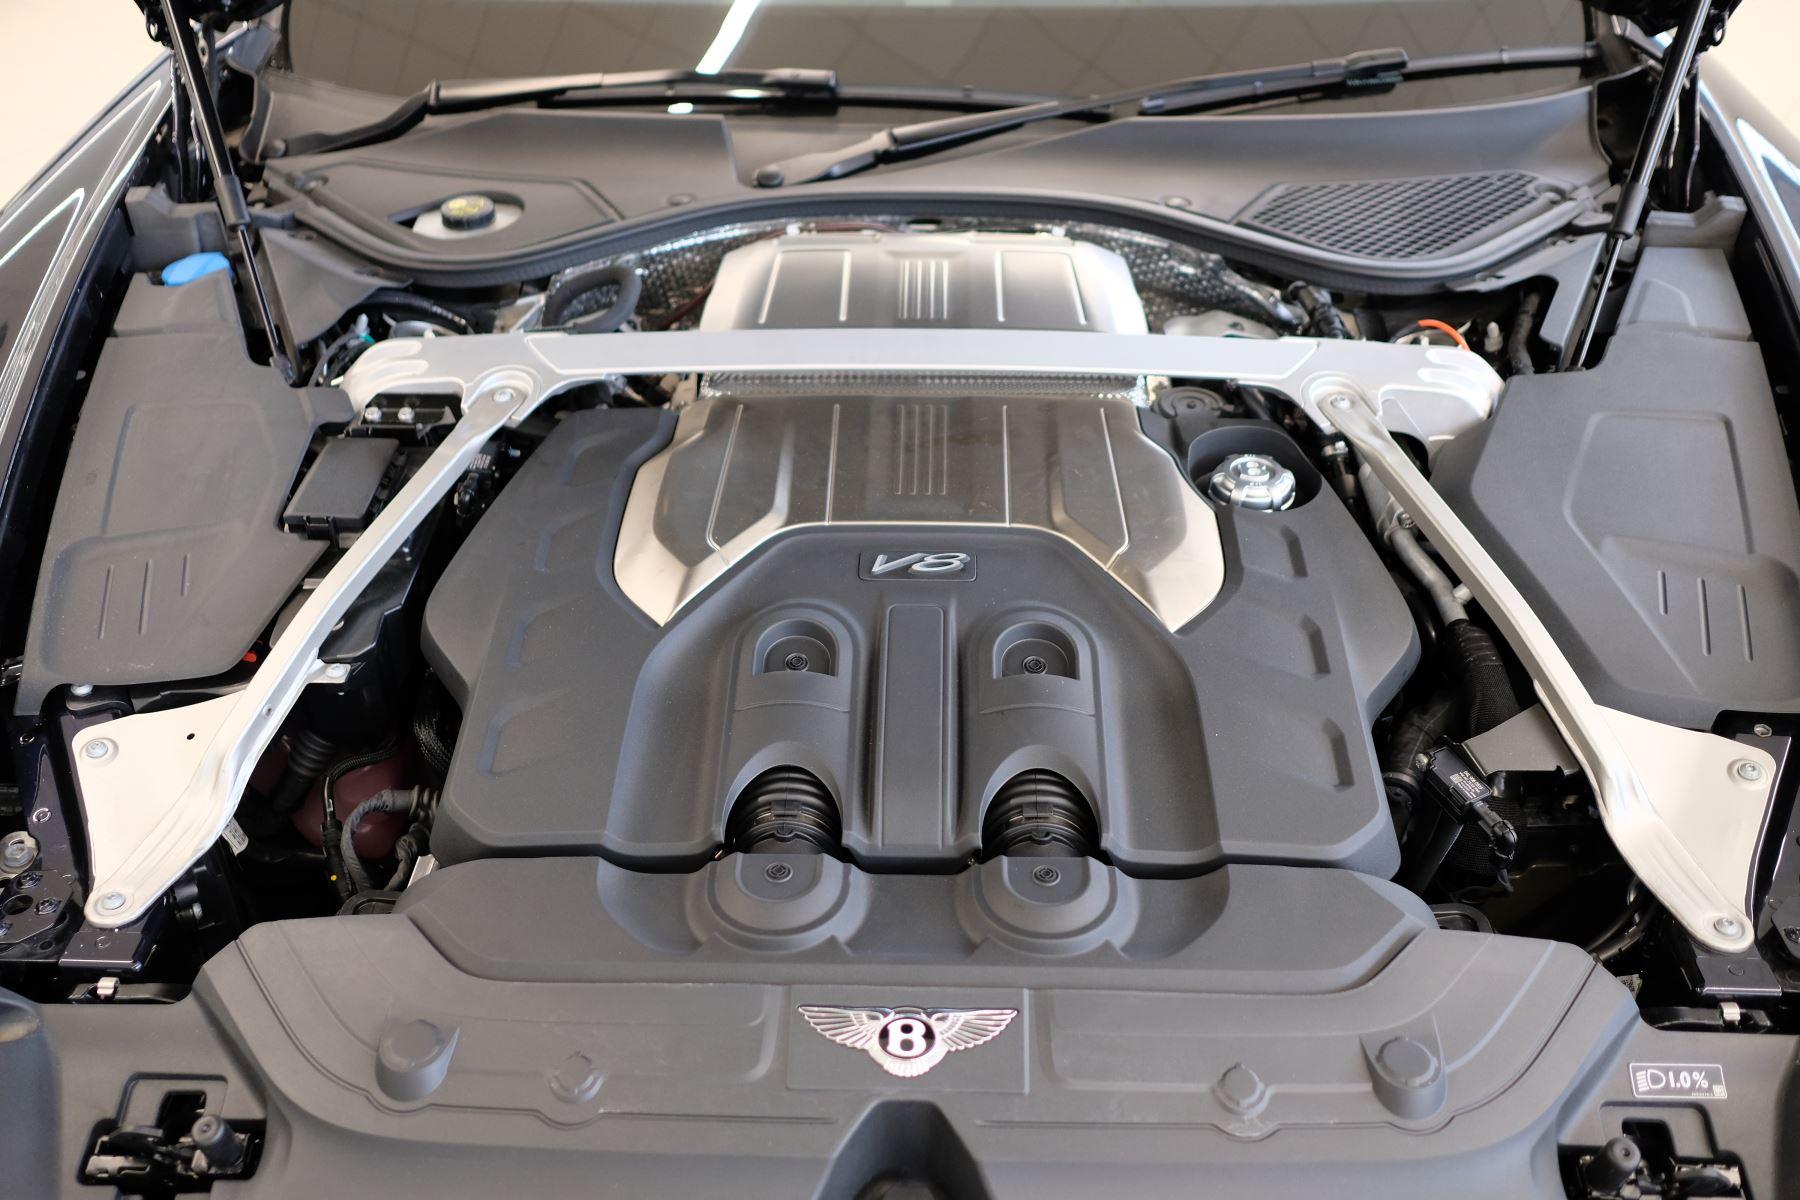 Bentley Continental GT 4.0 V8 Mulliner Edition Auto [Tour Spec] image 10